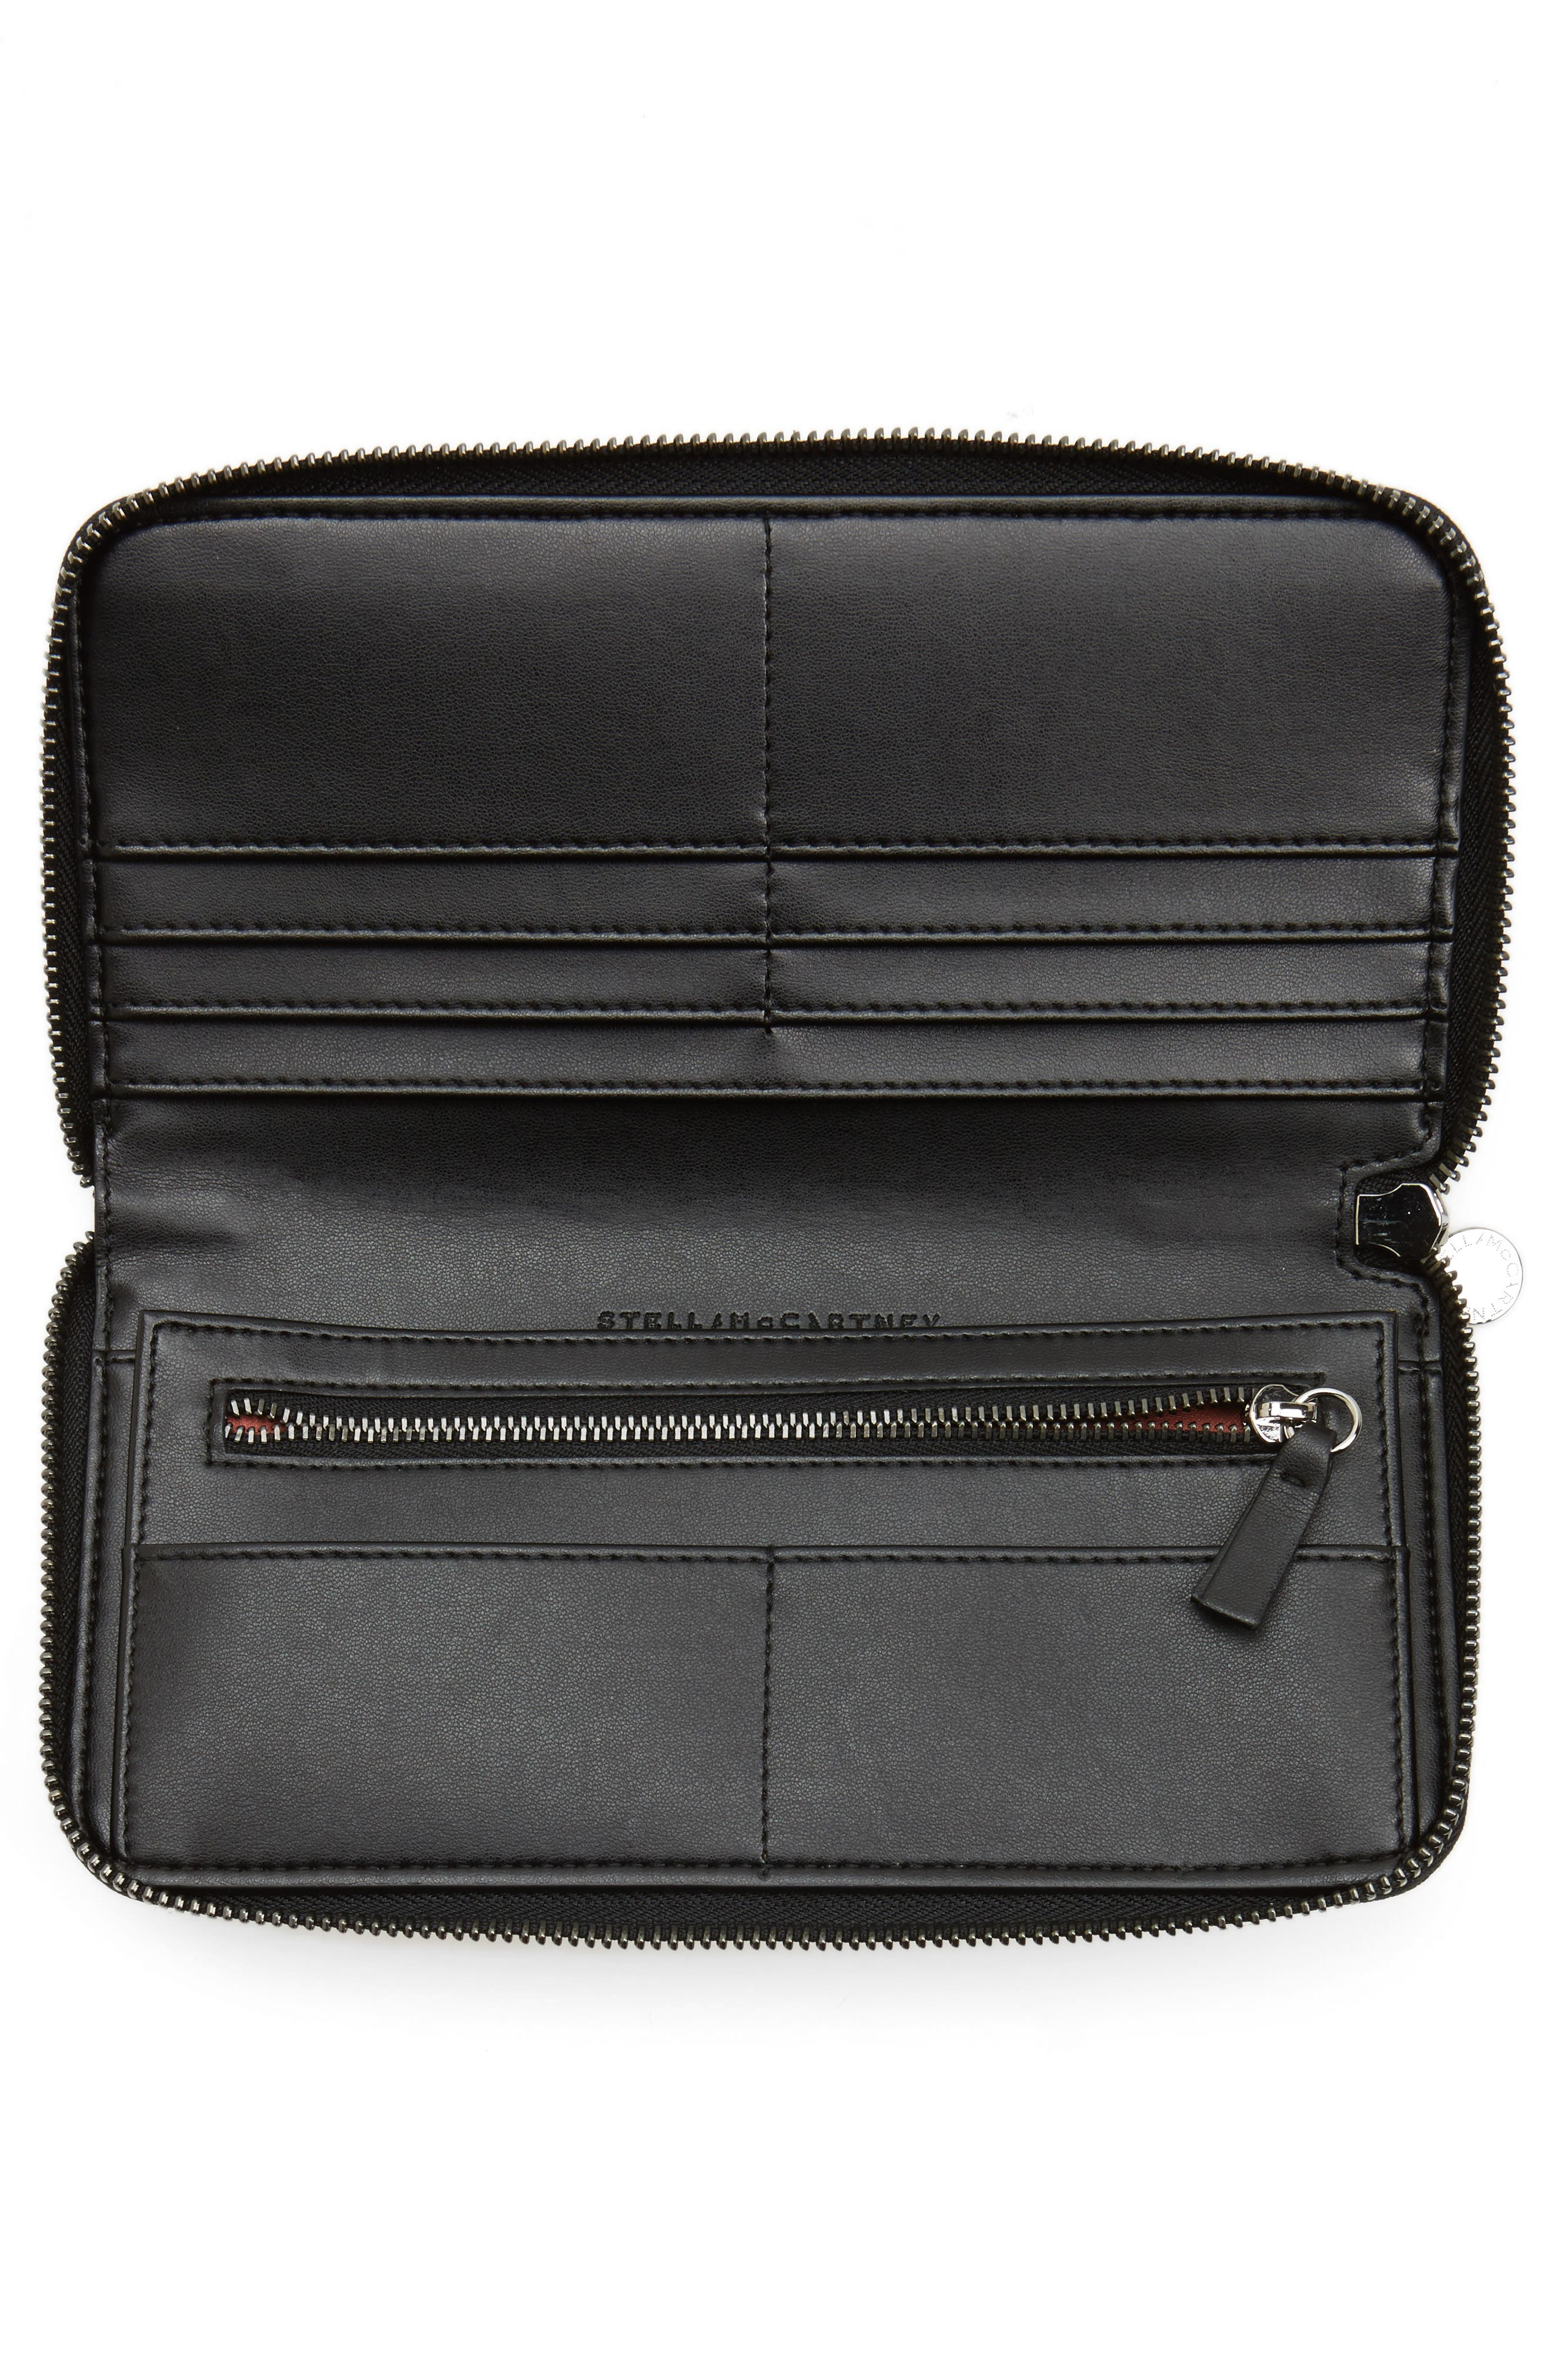 Falabella Faux Leather Wallet,                             Alternate thumbnail 2, color,                             001